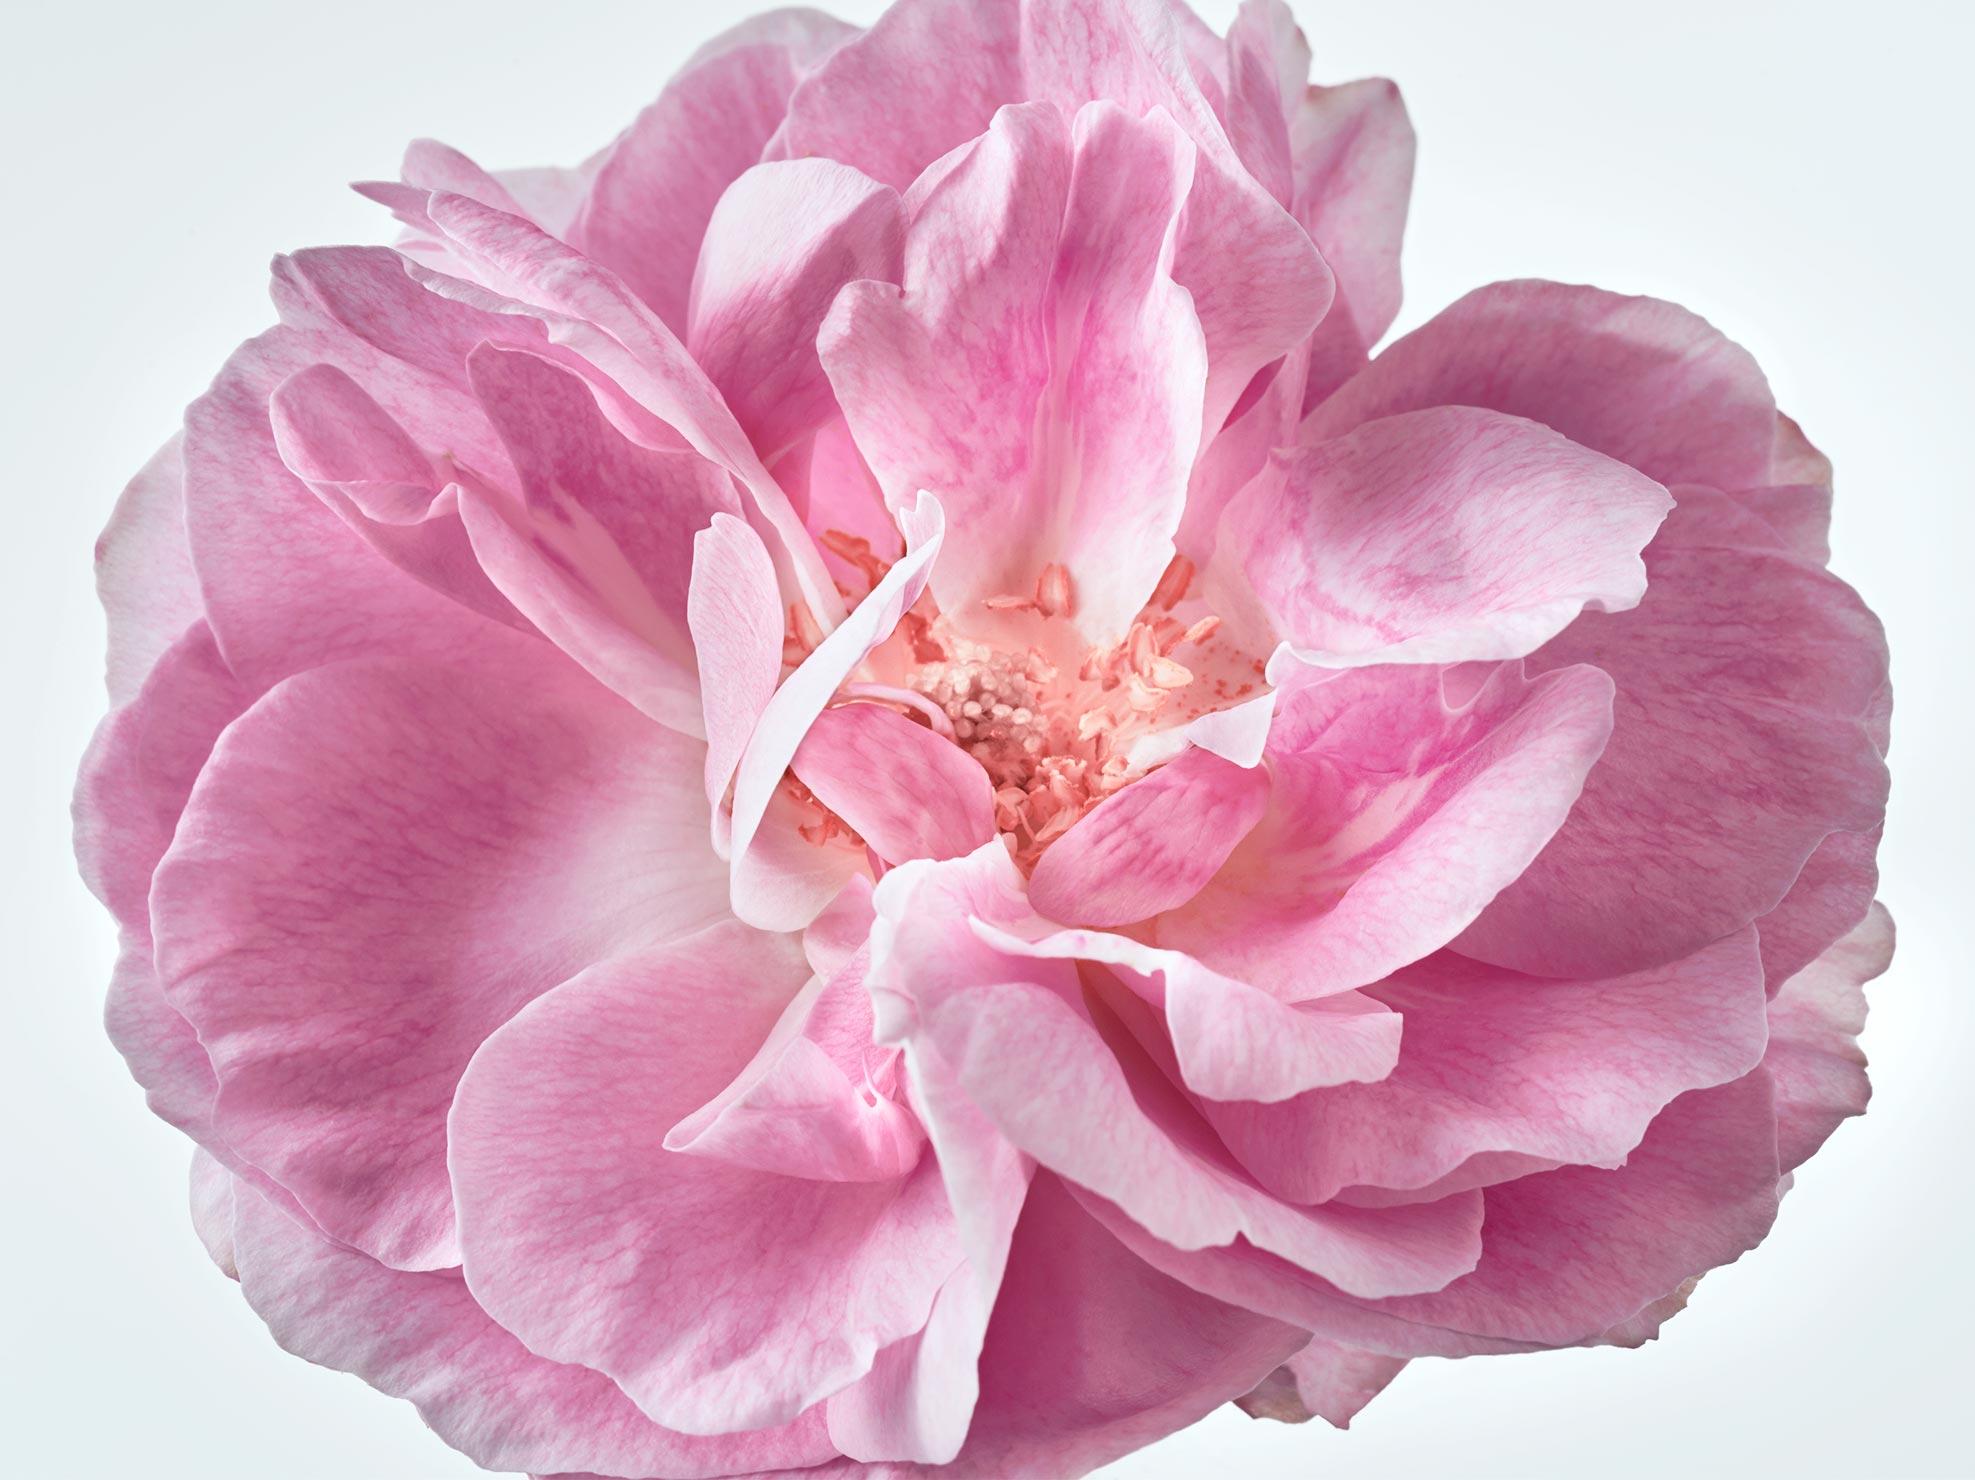 56-Flora-June20180241.jpg